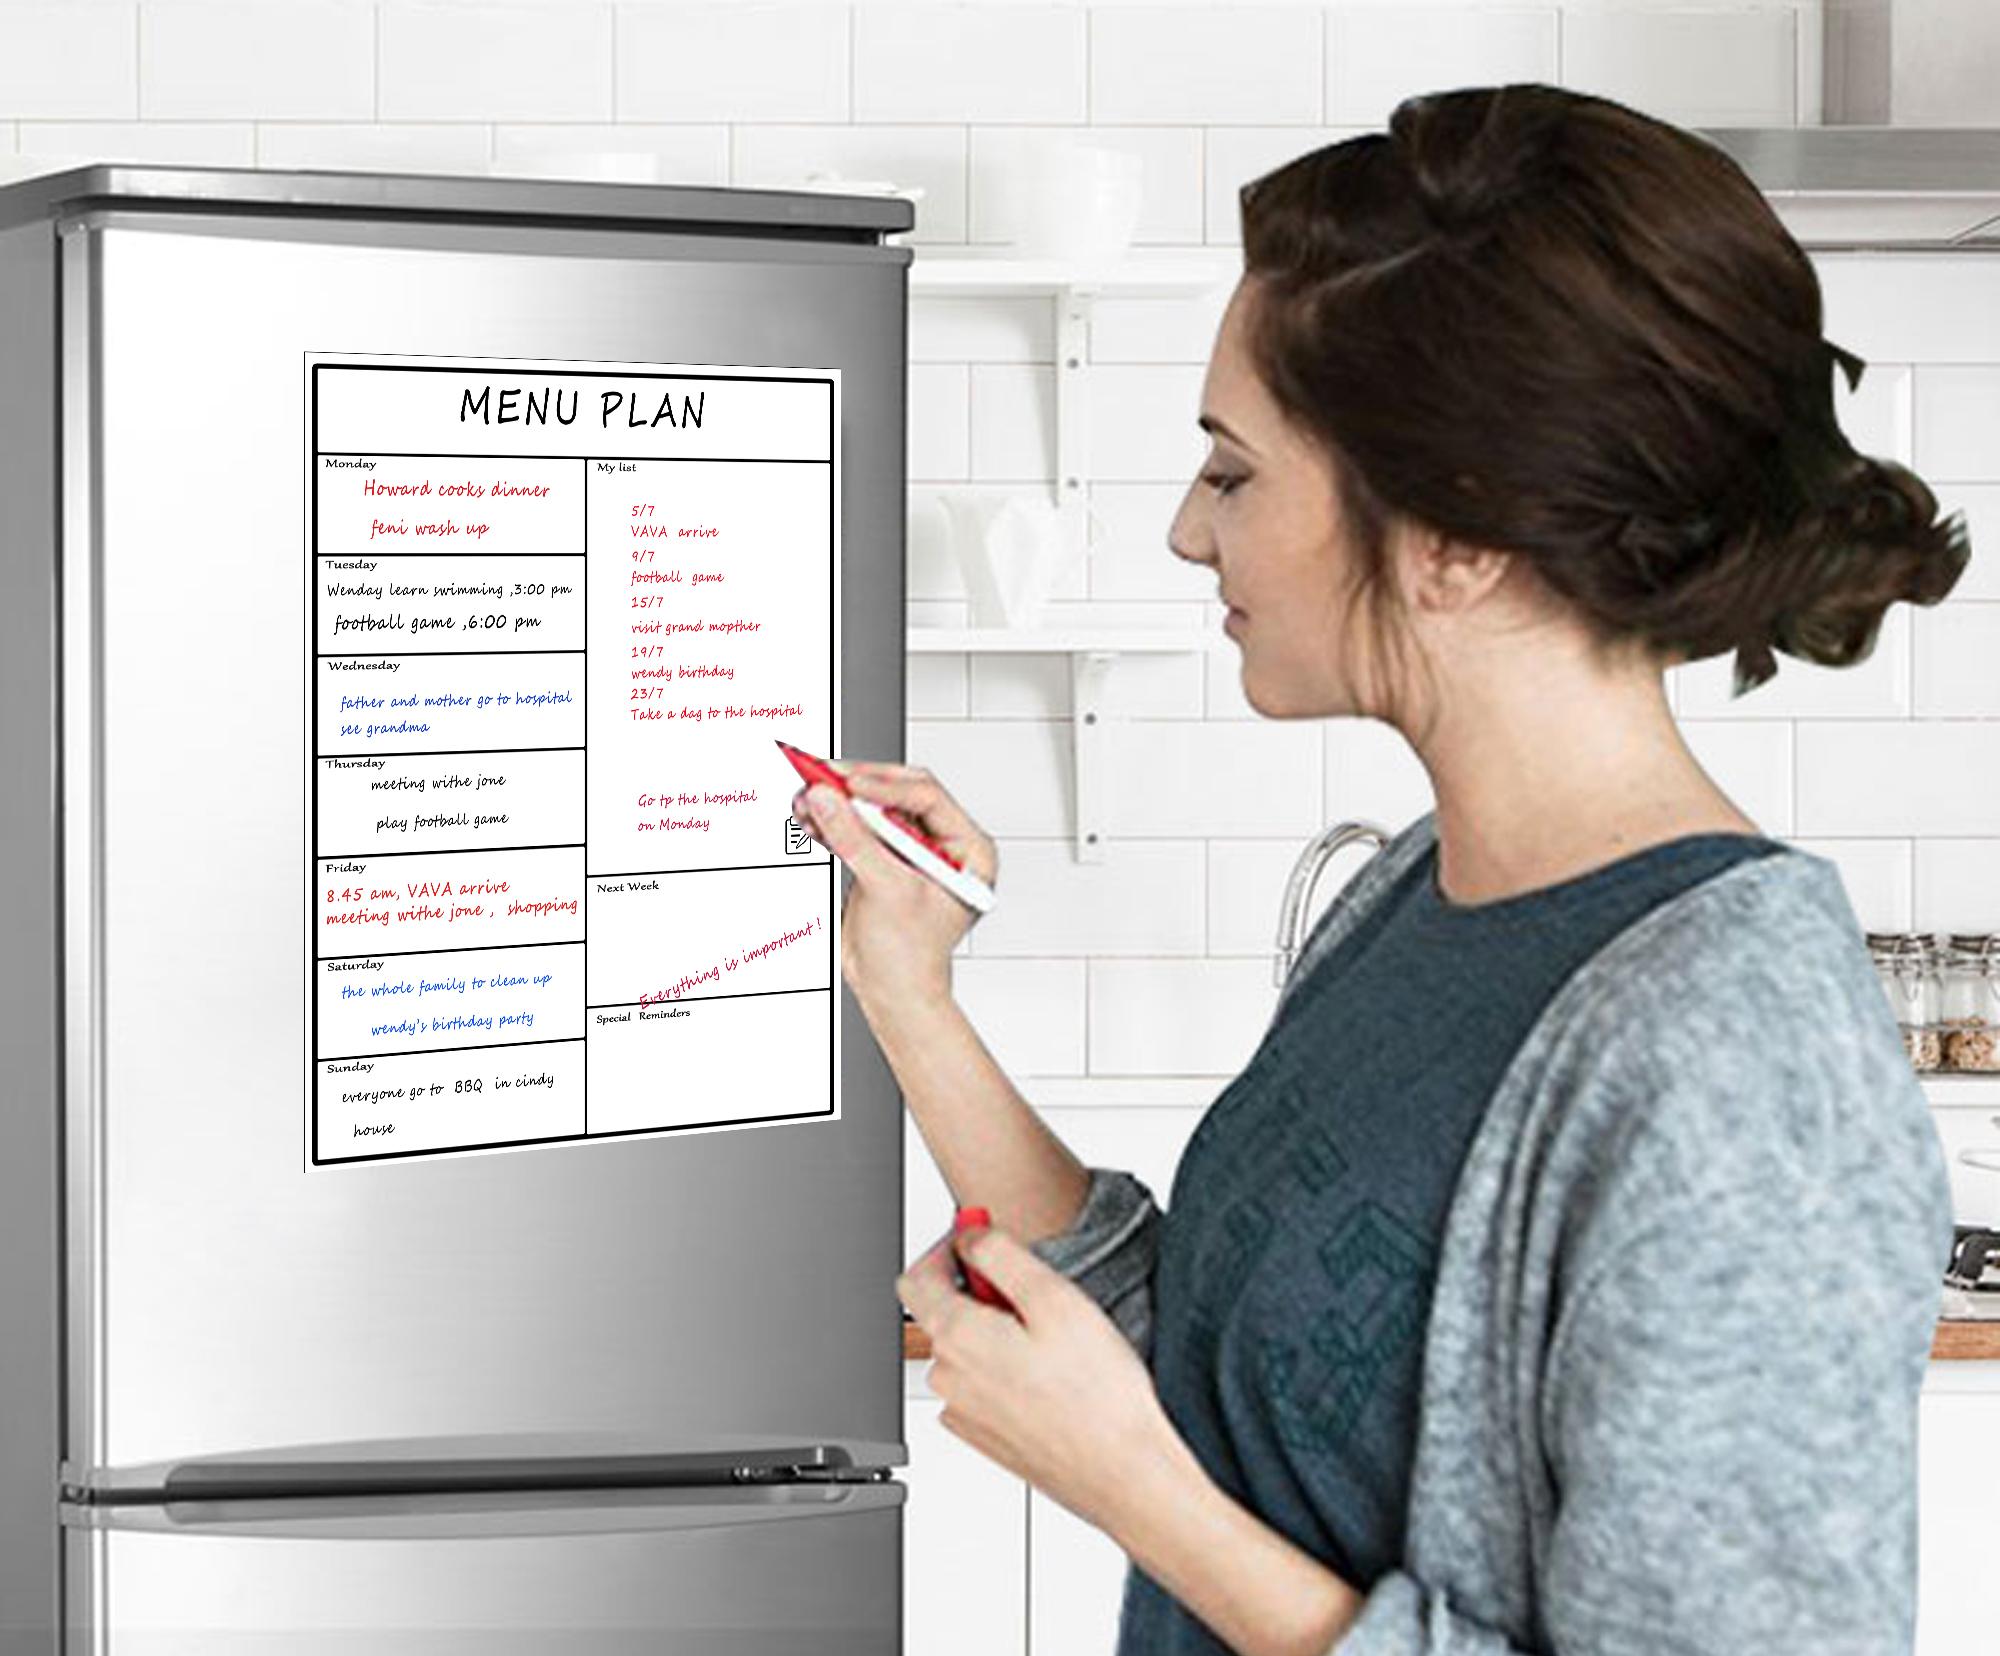 Custom Classroom Writable Fridge Magnetic Organizer Calendar Kids Refrigerator Magnet Target To Do List Sheet Buy Product On Alibaba Com